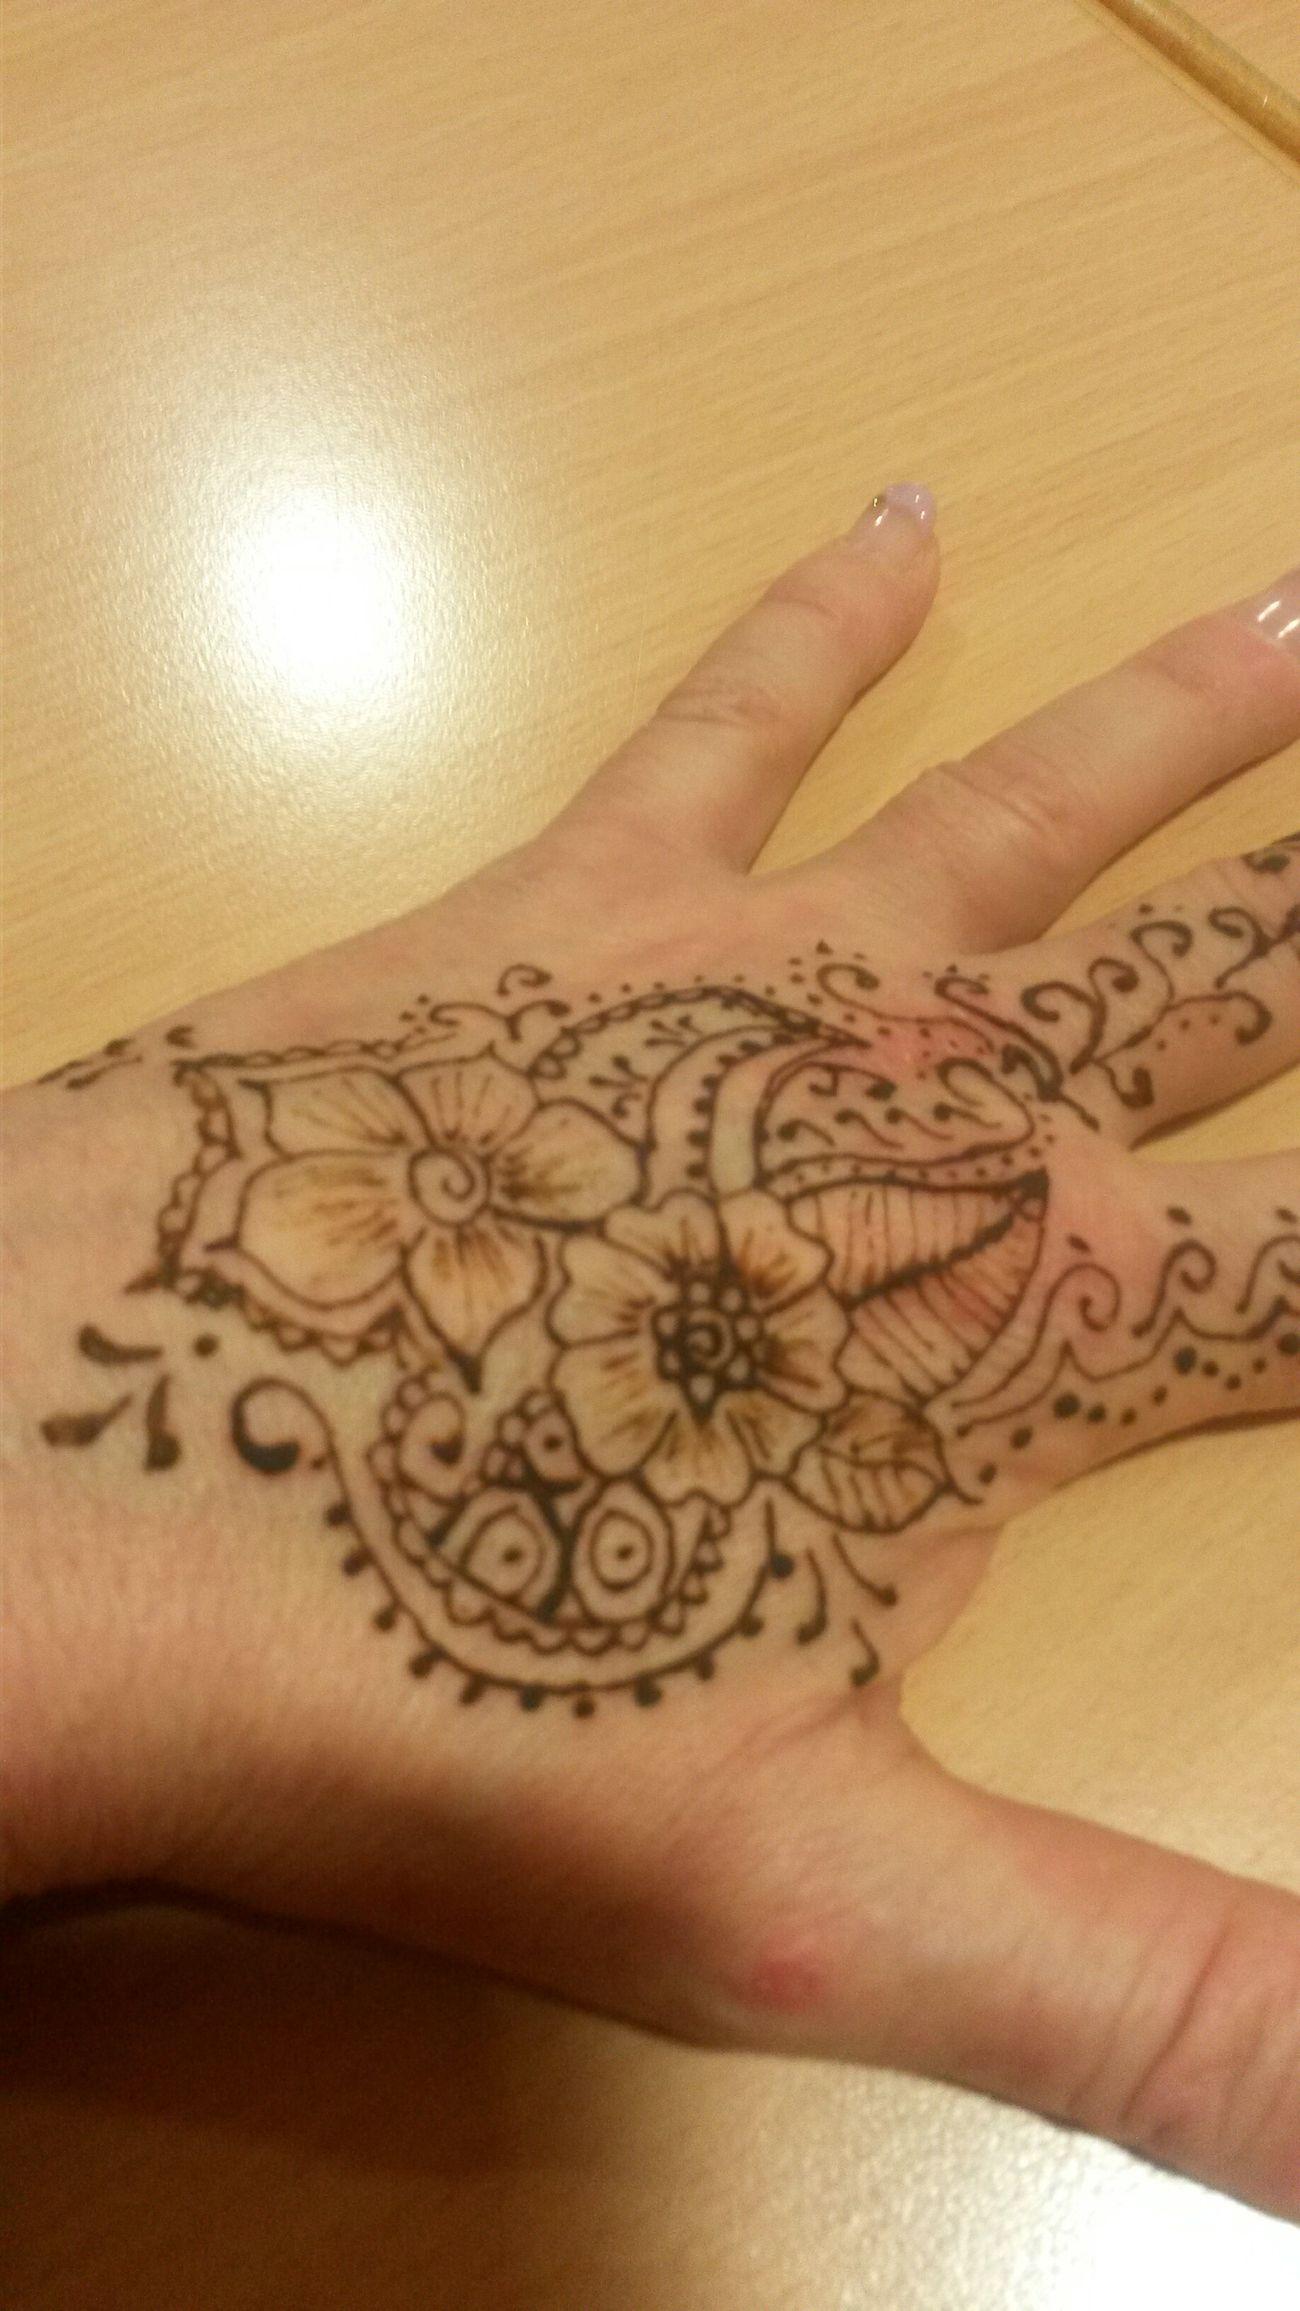 Henna tatooo